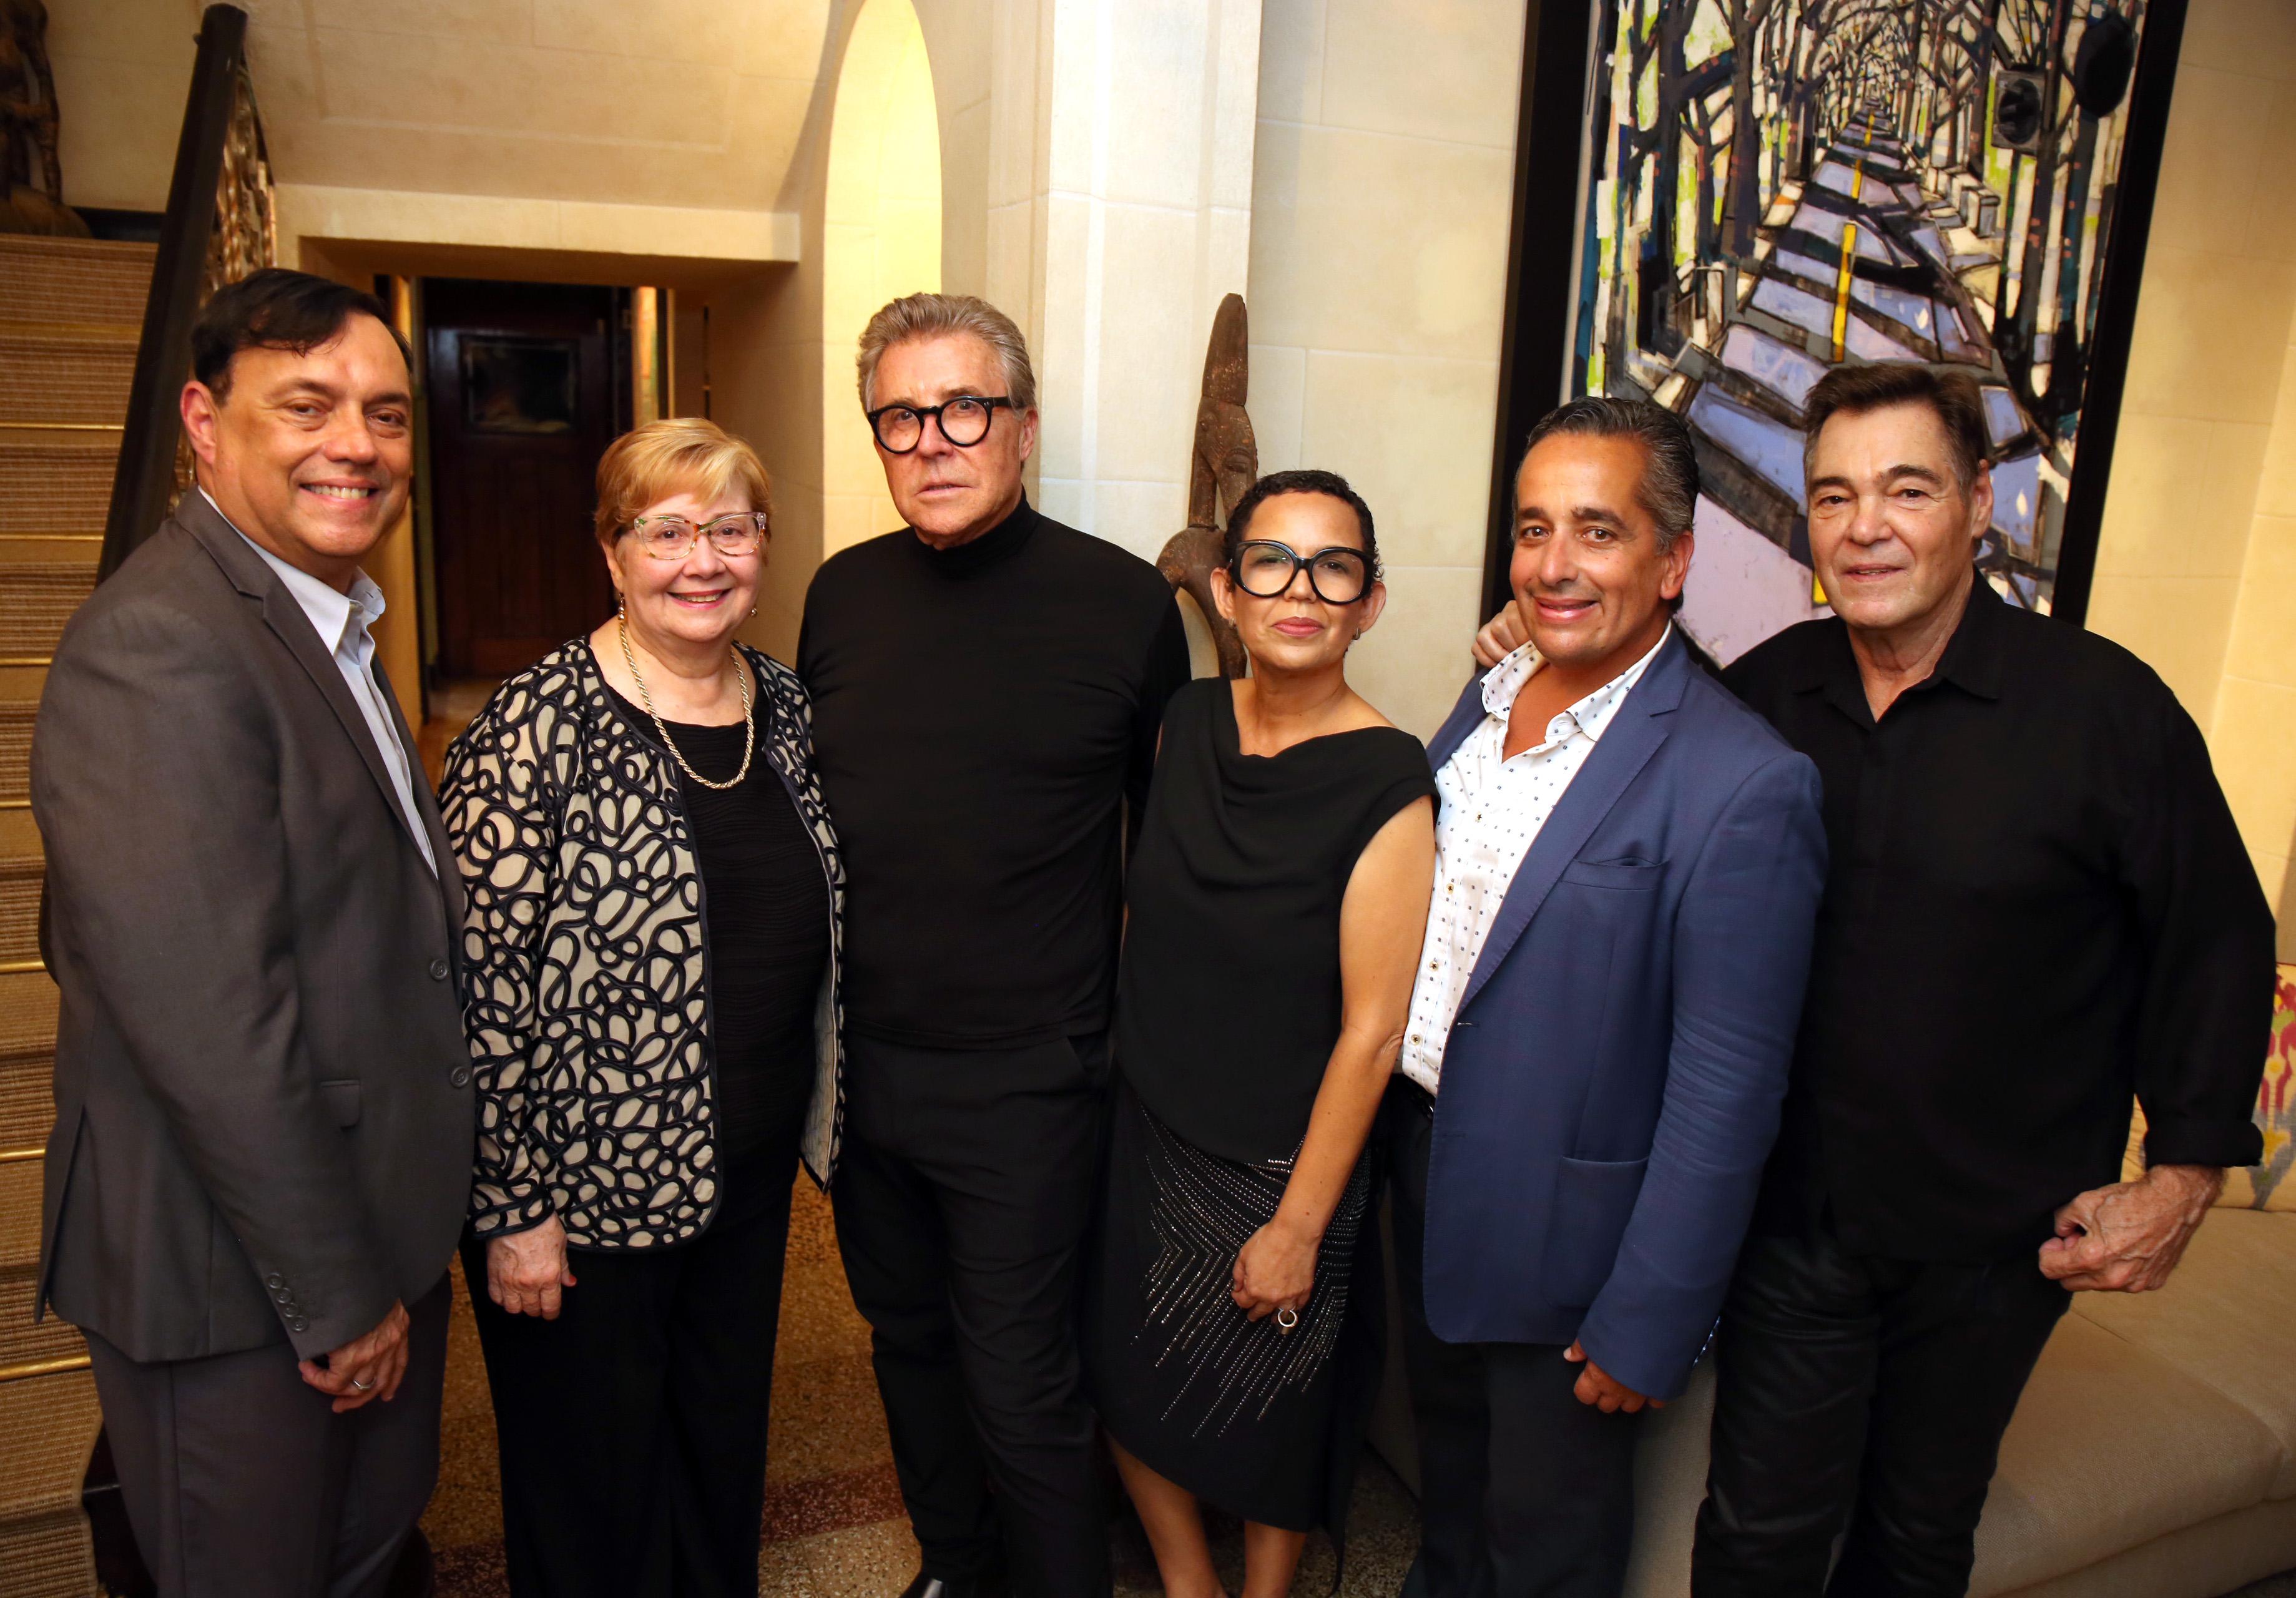 David Méndez, Carmen Ruiz de Fischler, Nono Maldonado, Aurorisa Mateo, Juan Ernesto Ayala y Polo McConnie. (José. R. Pérez Centeno)